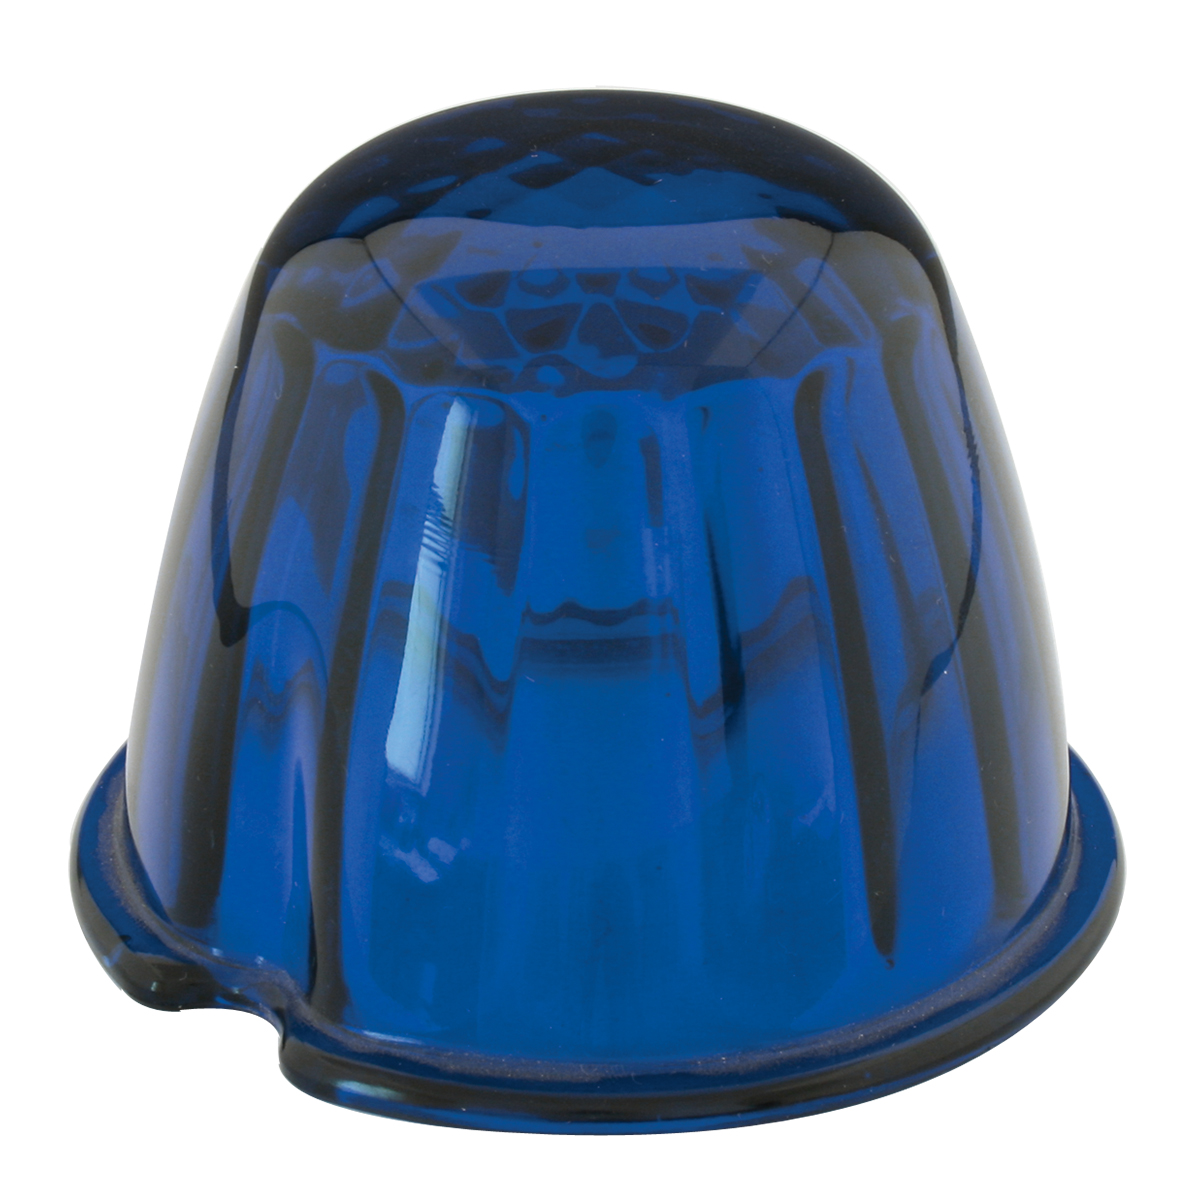 #92002 Reflector Blue Glass Lens